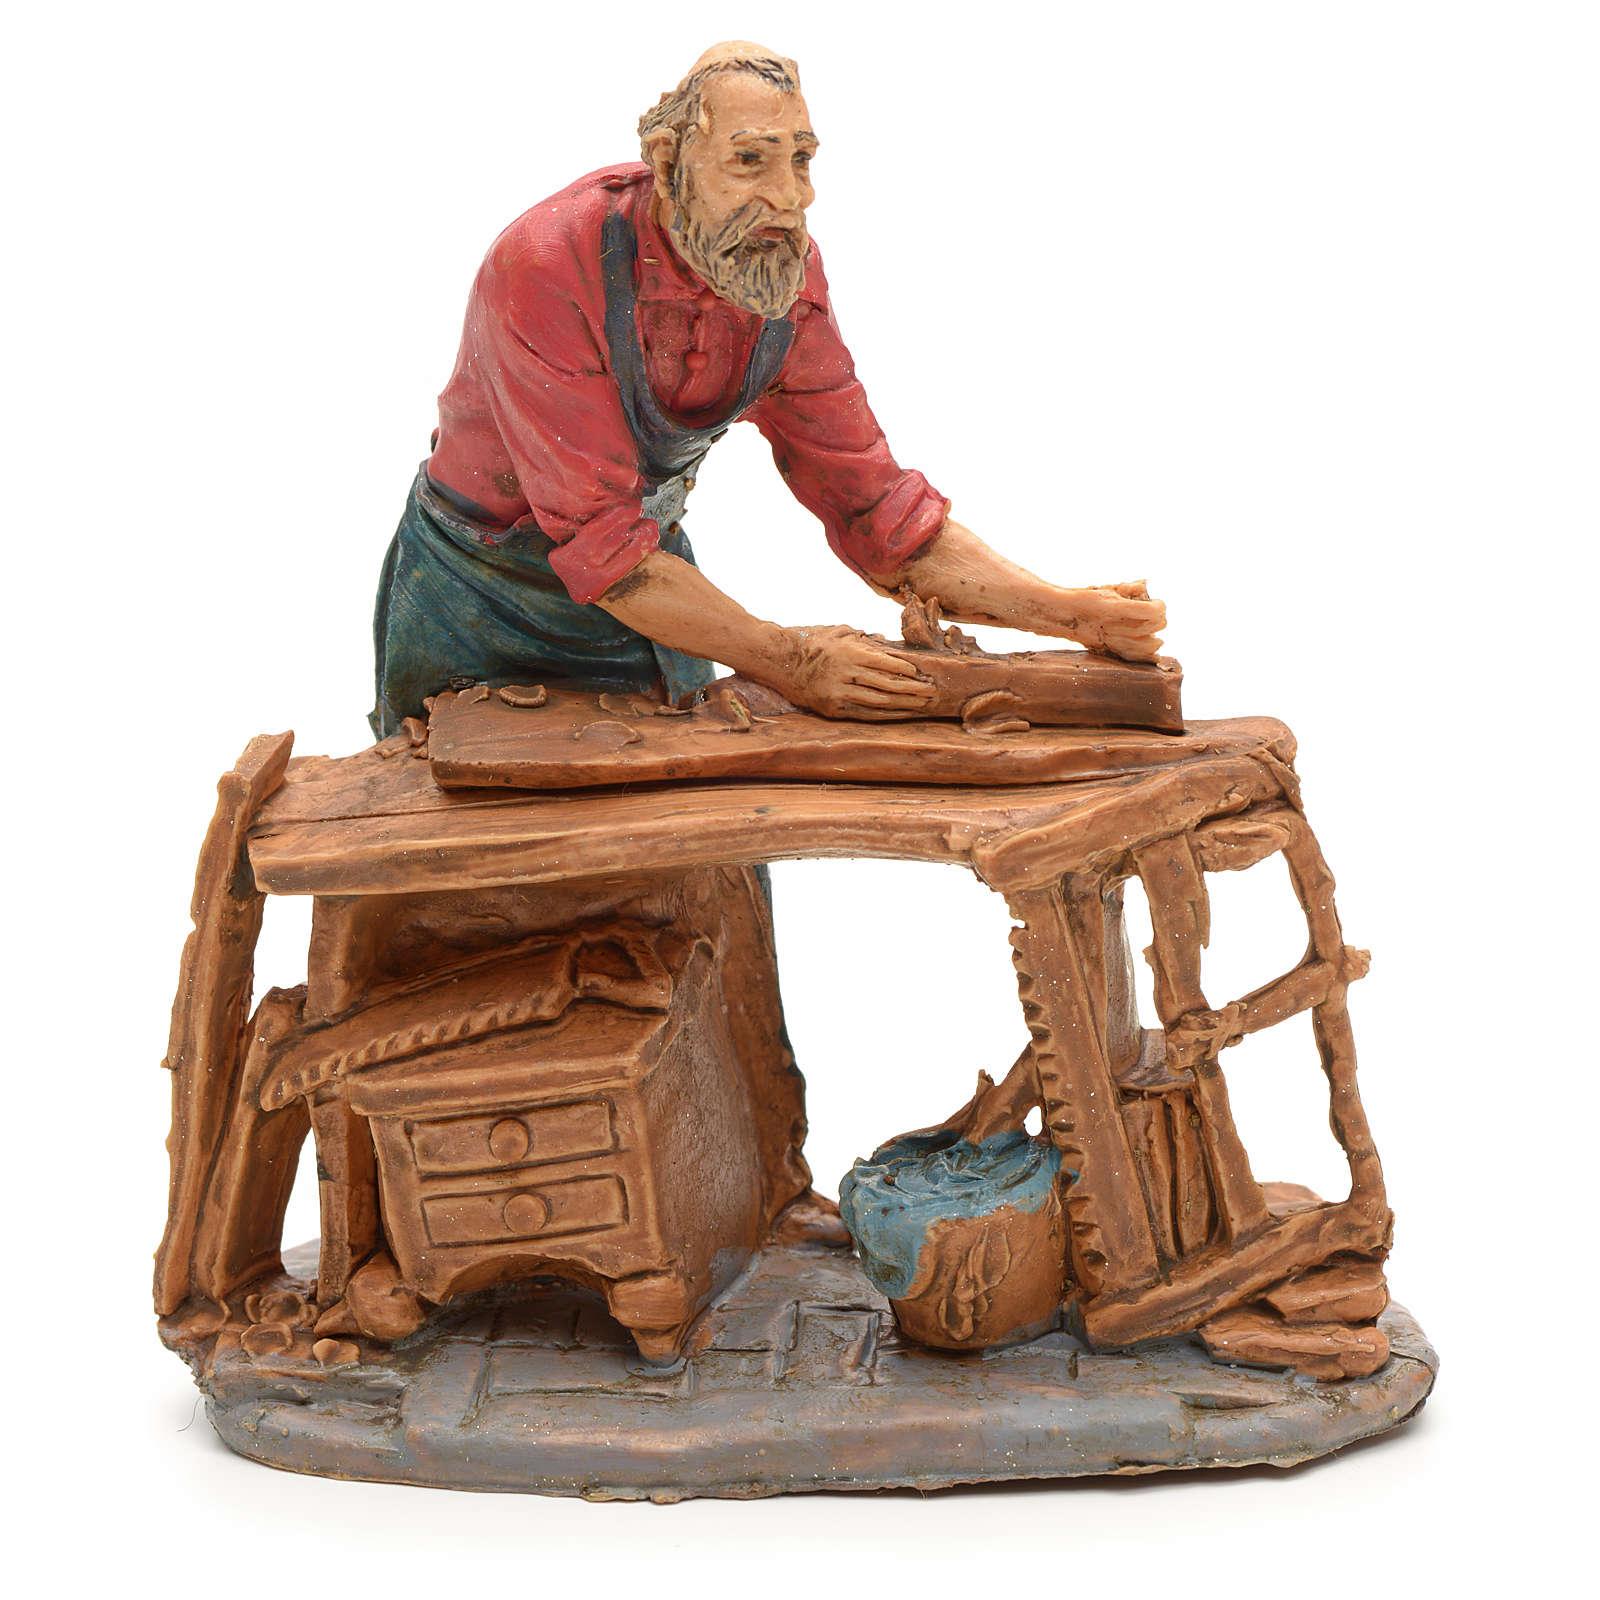 Nativity set accessory, Carpenter figurine 3